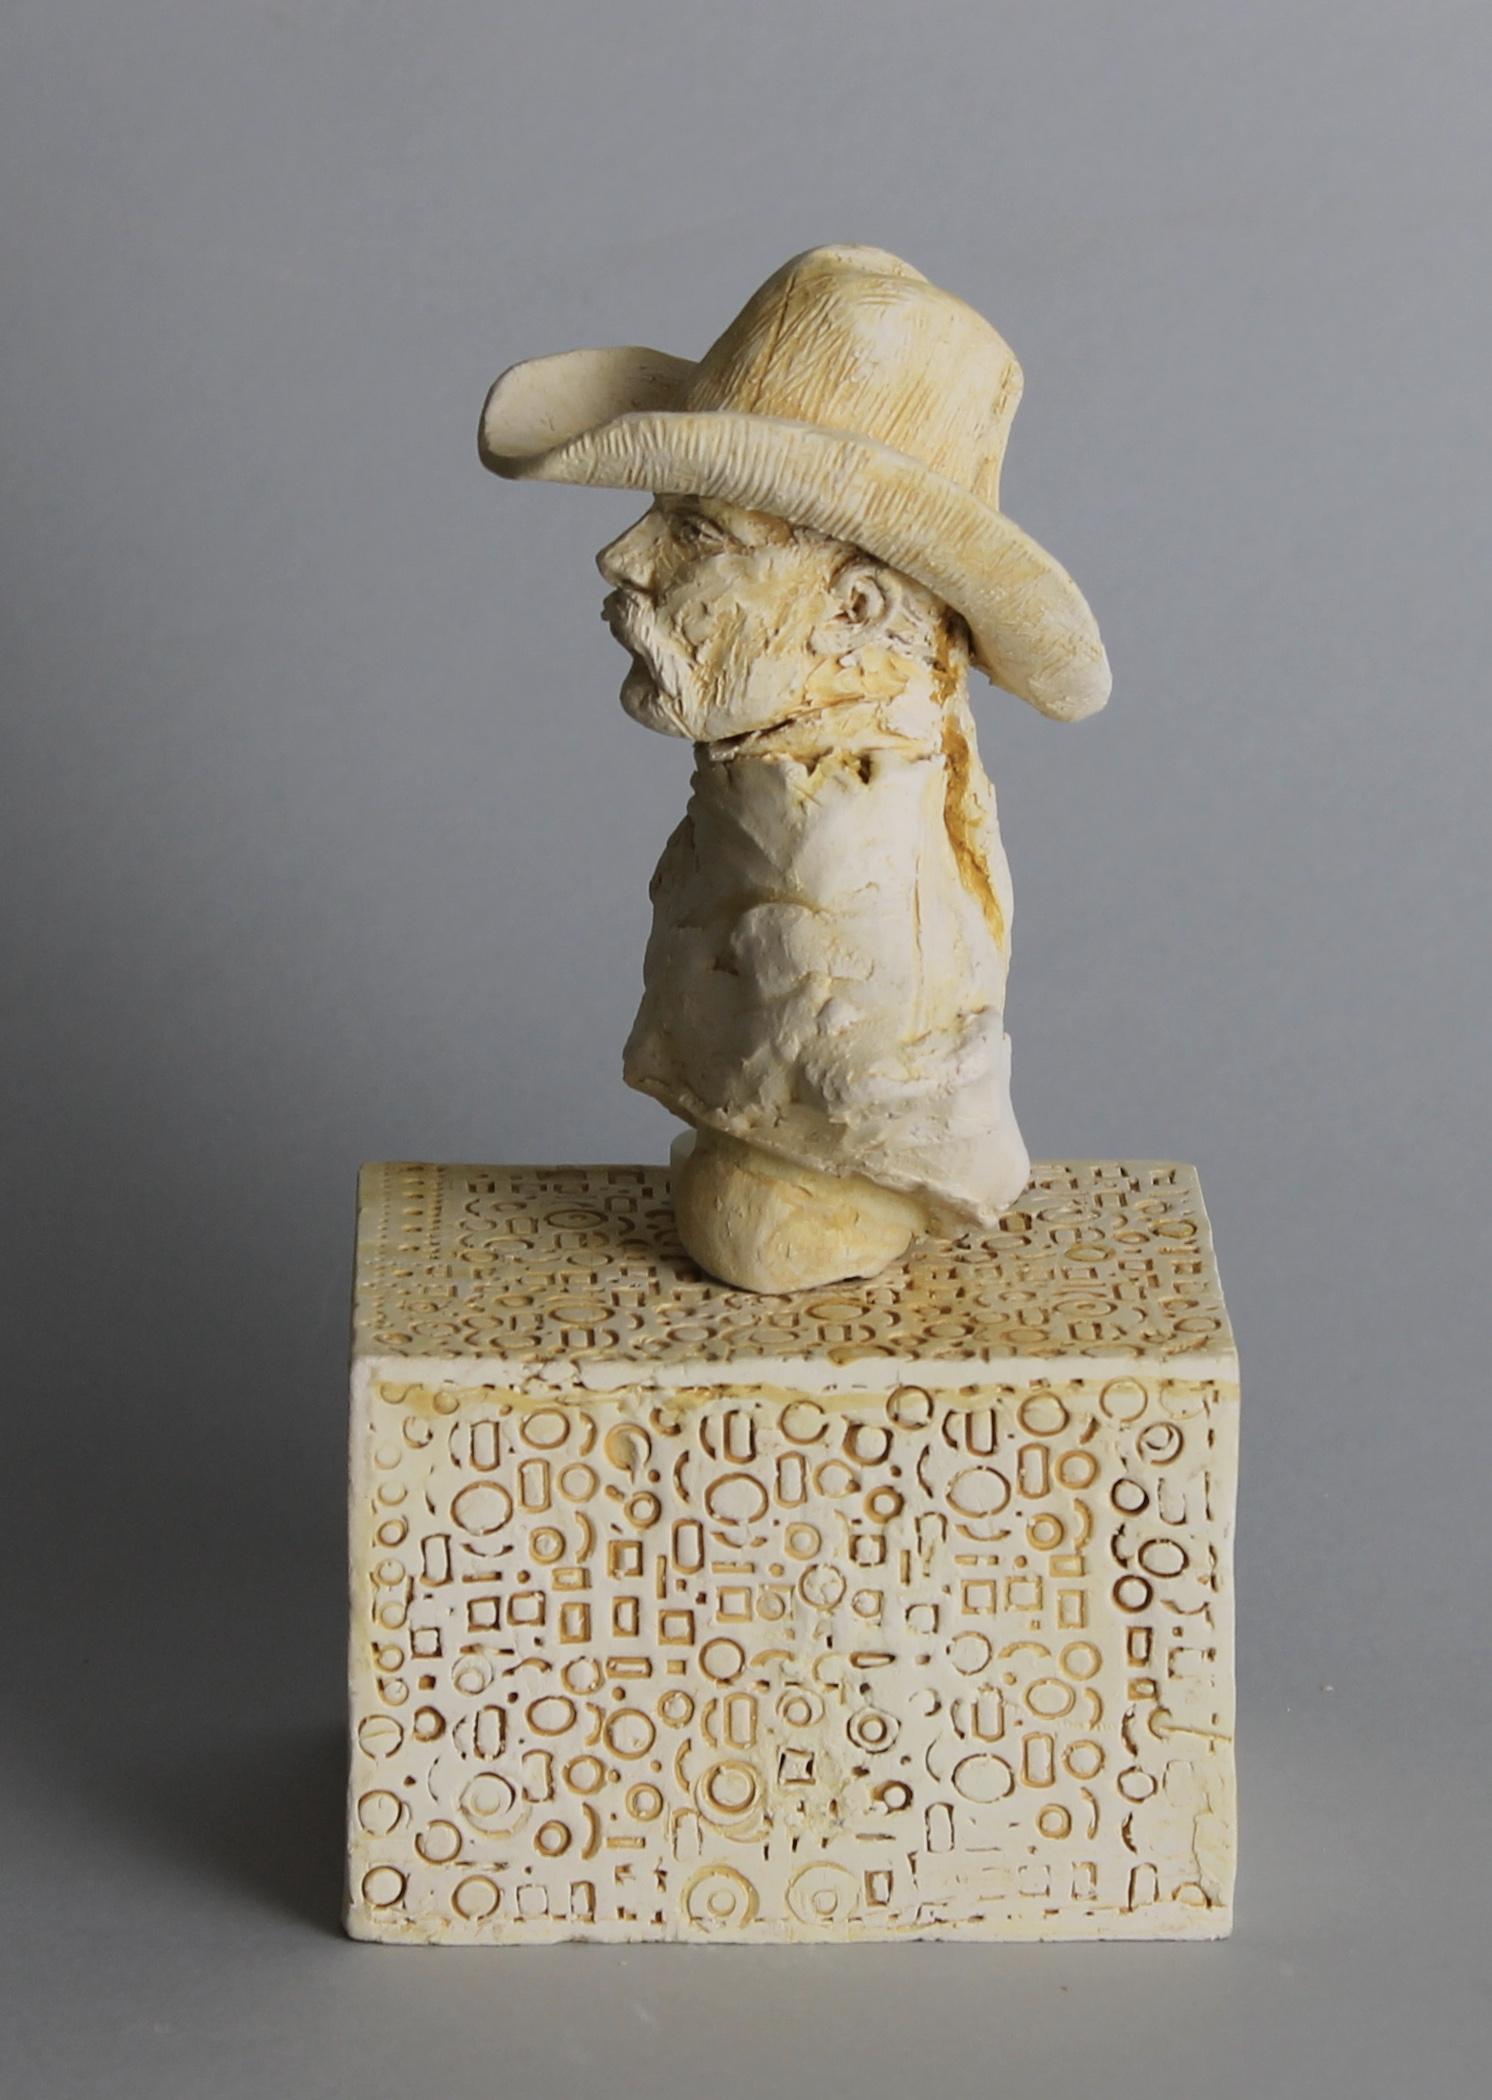 Clay Cowboy I, ceramic base